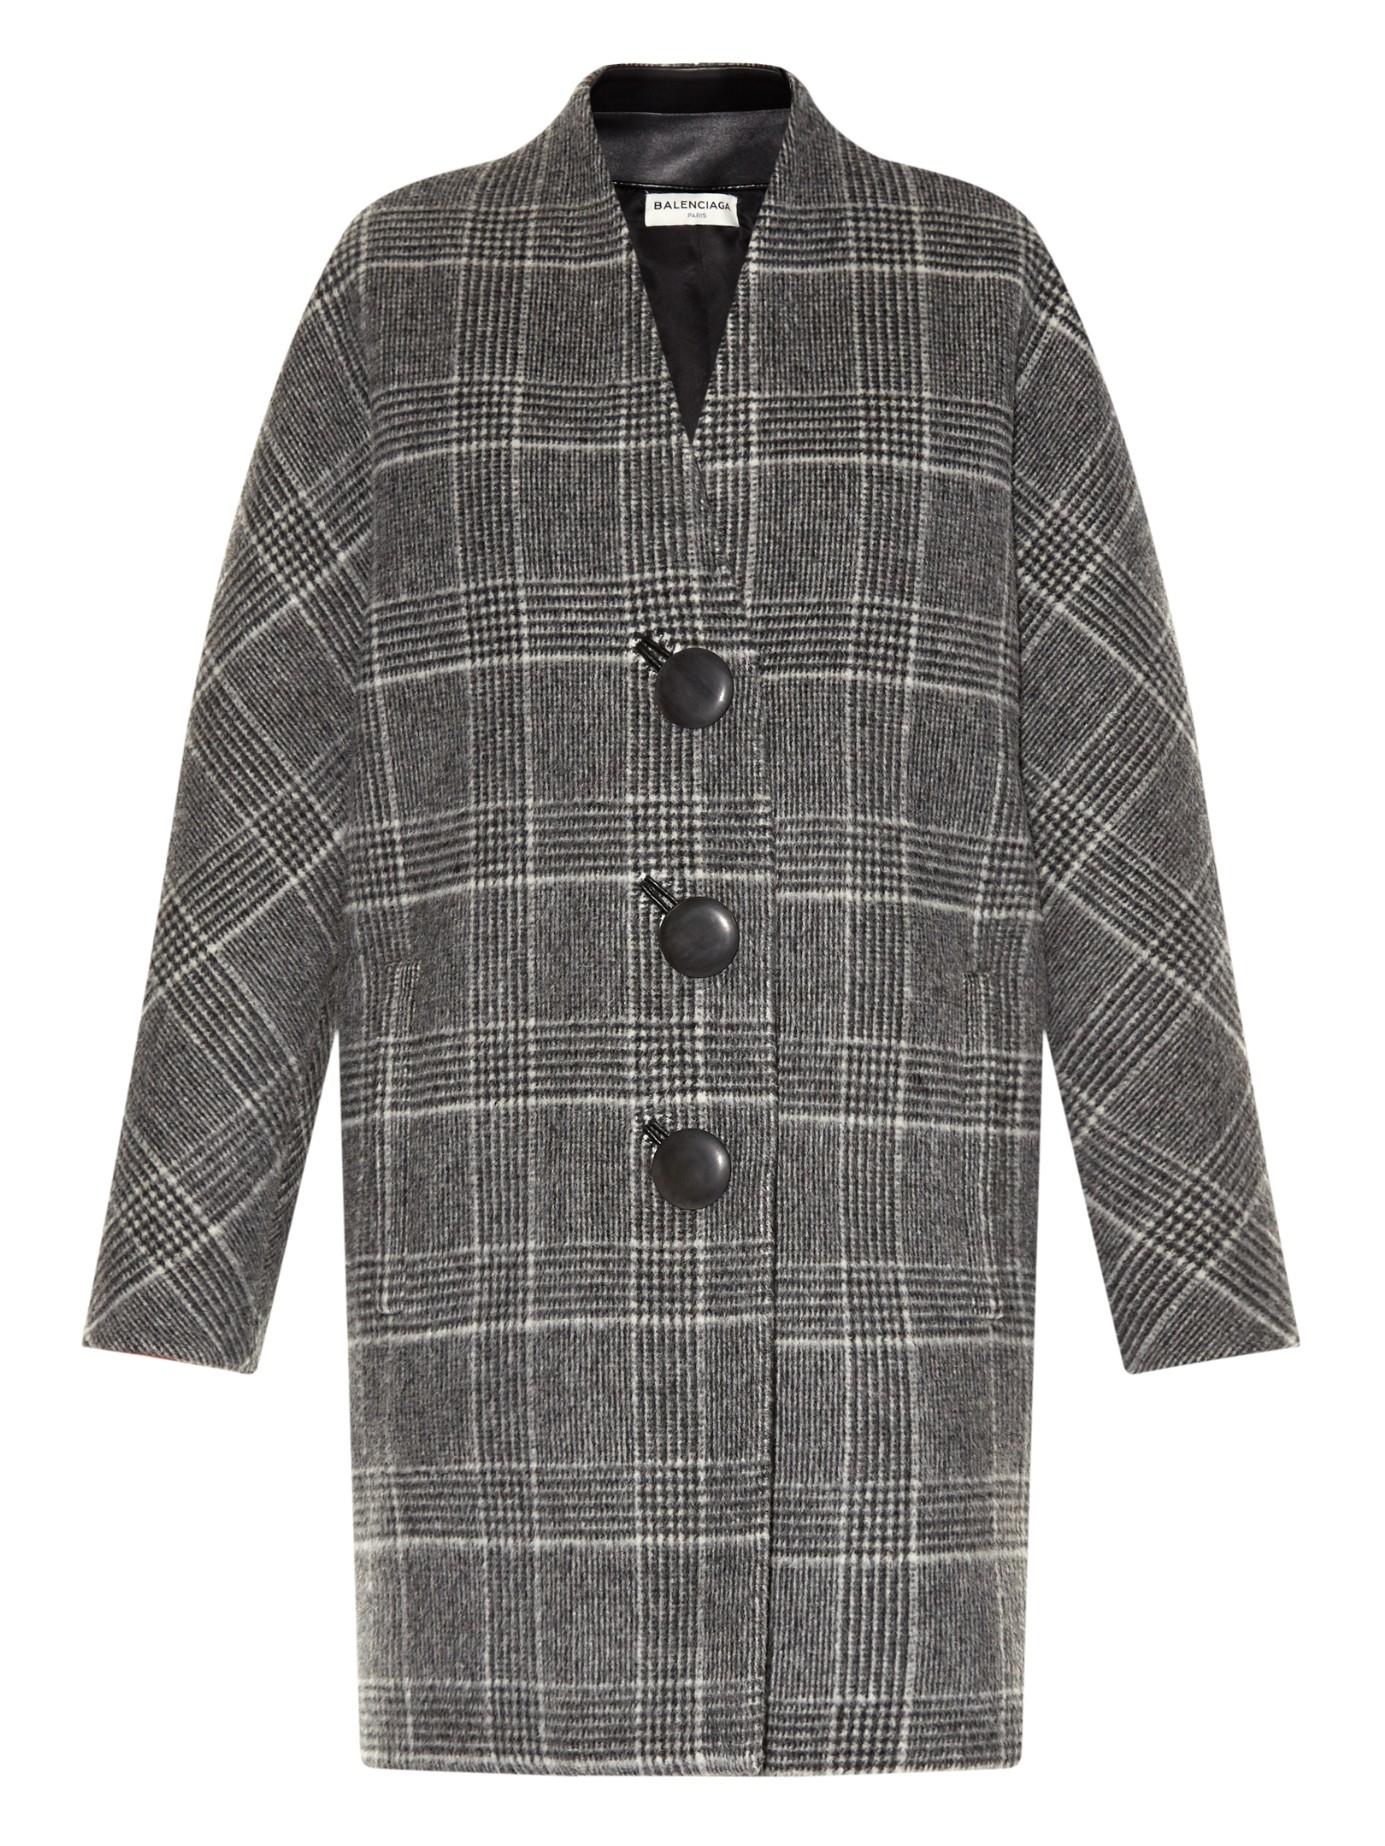 Balenciaga Wool And Alpaca Blend Cocoon Coat In Black Lyst